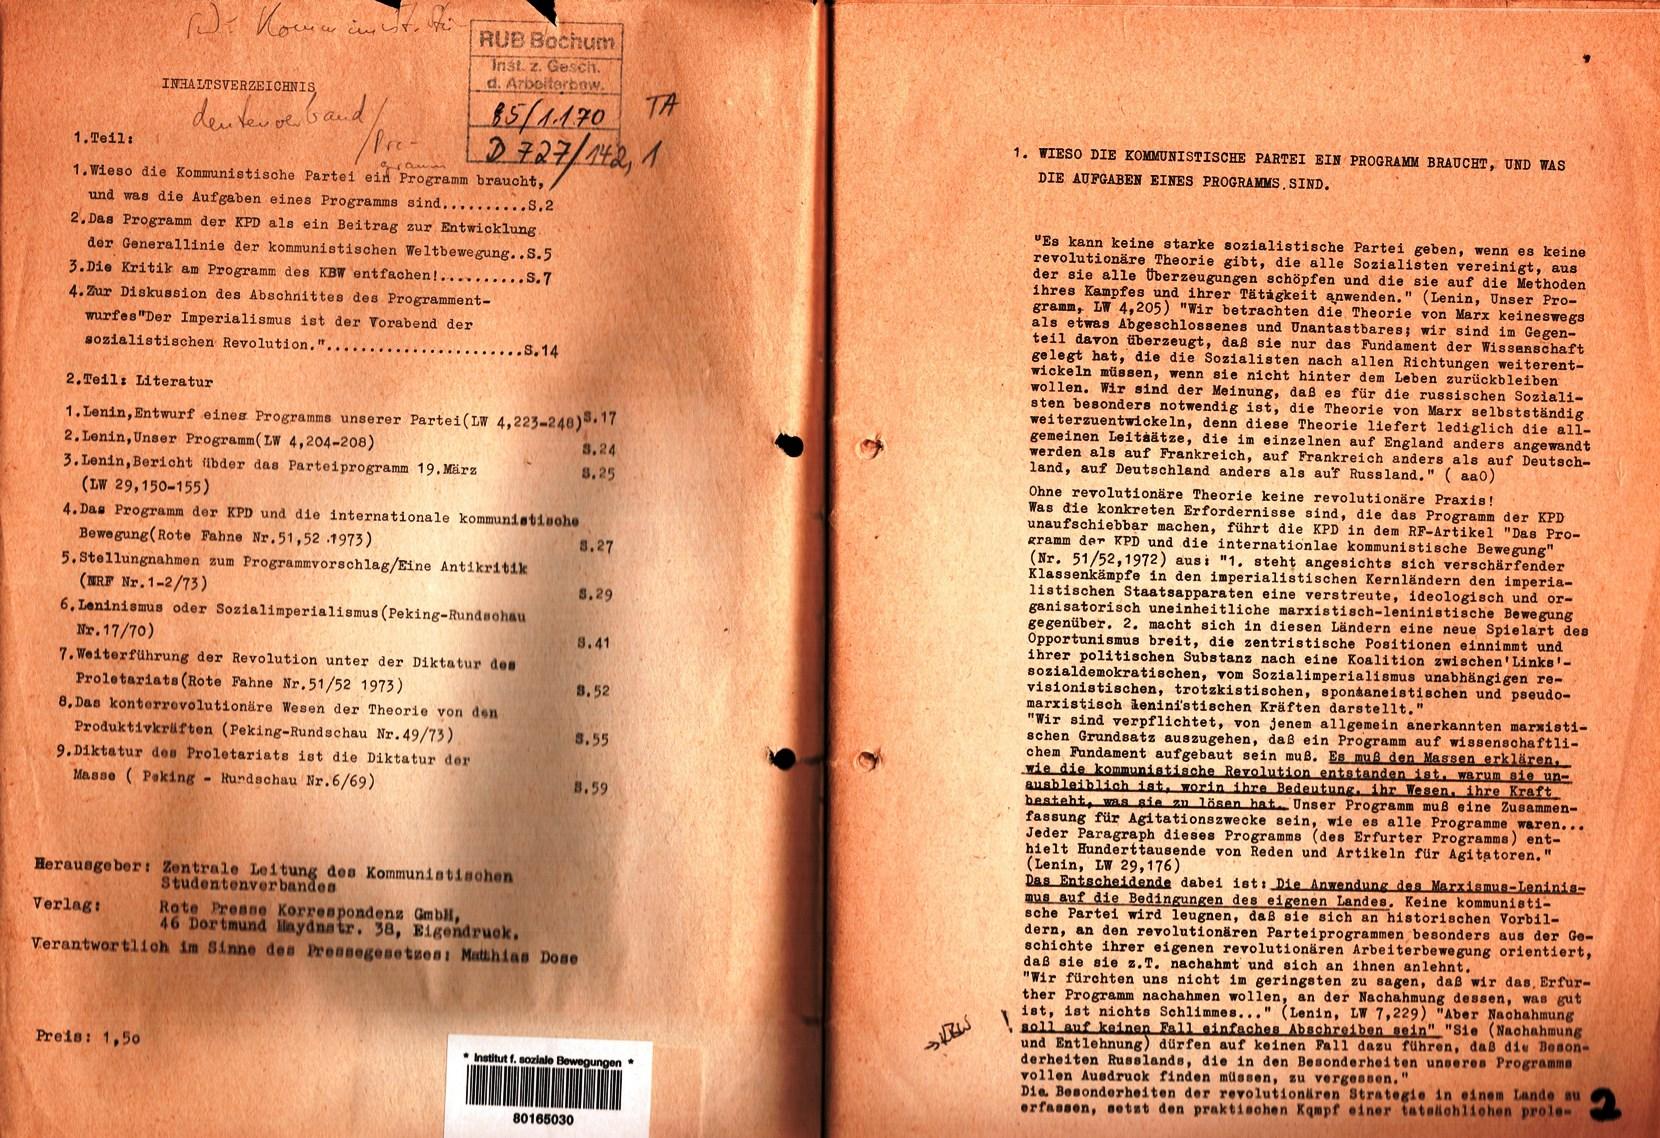 KSV_1974_Materialien_zur_Programmdiskussion_01_002